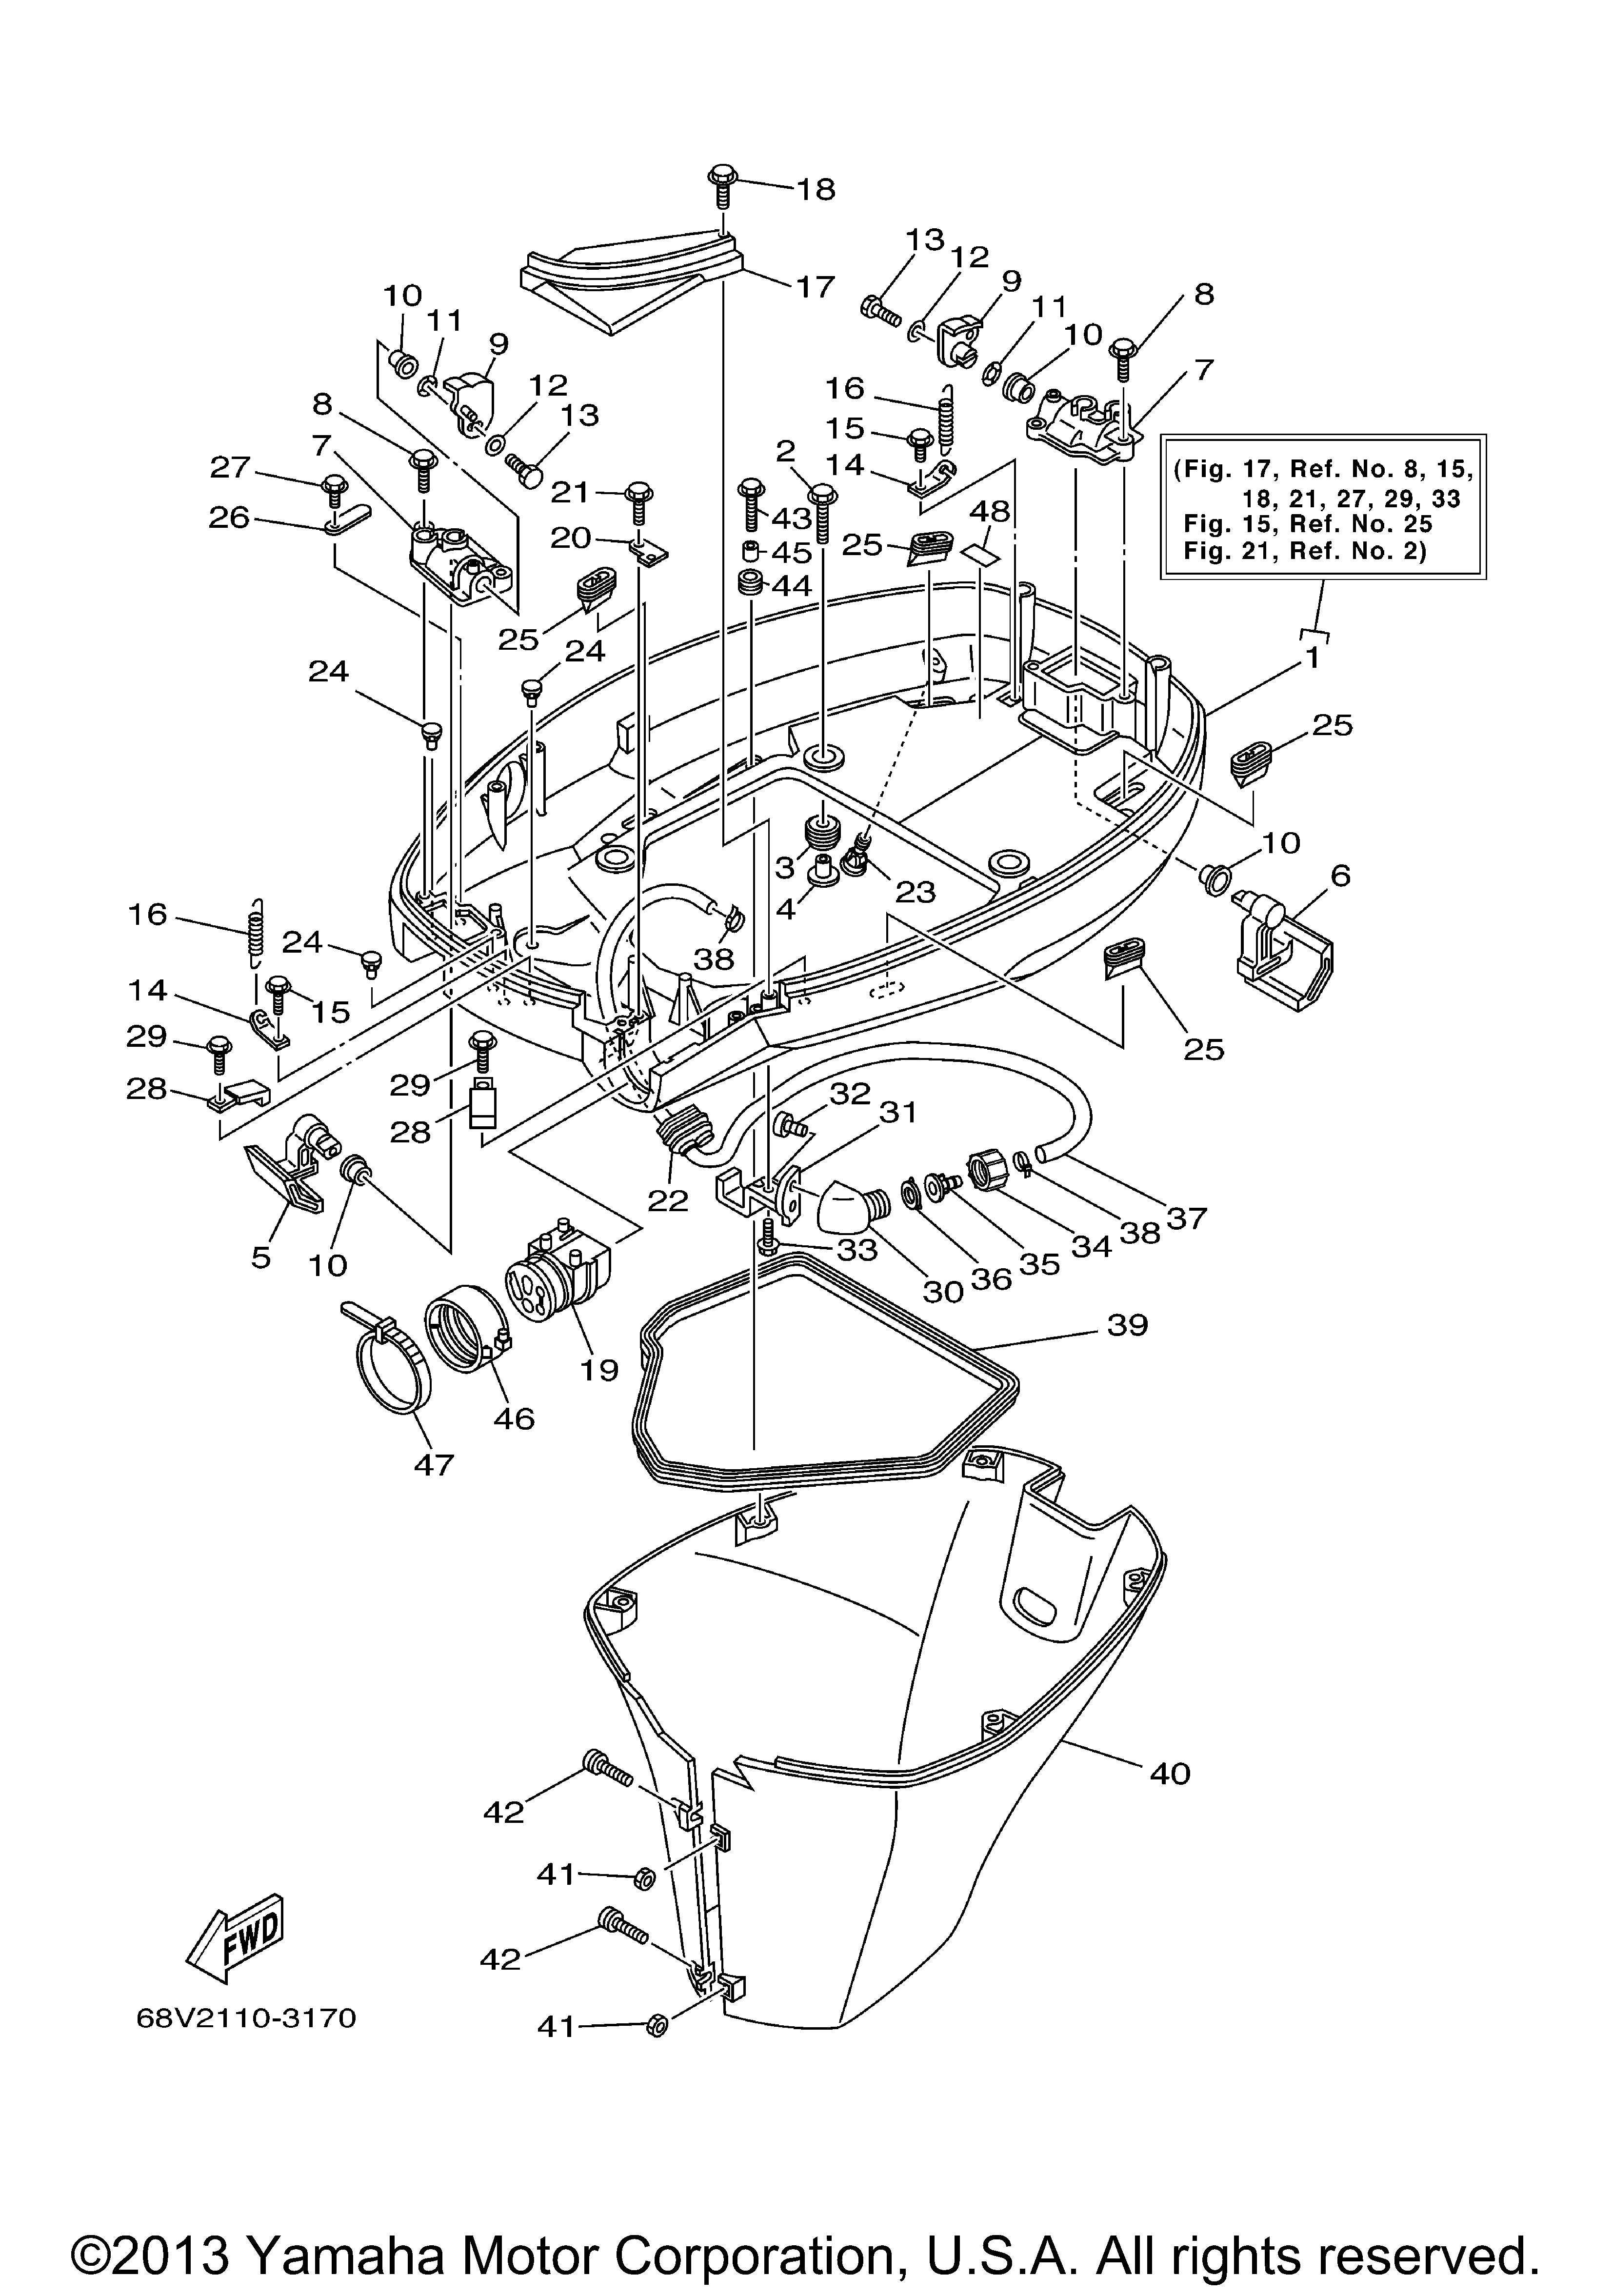 Yamaha 115 Hp Outboard Motors Parts Wiring Diagram F115txrb Bottom Cowling Rh Vansoutboardparts Com Johnson